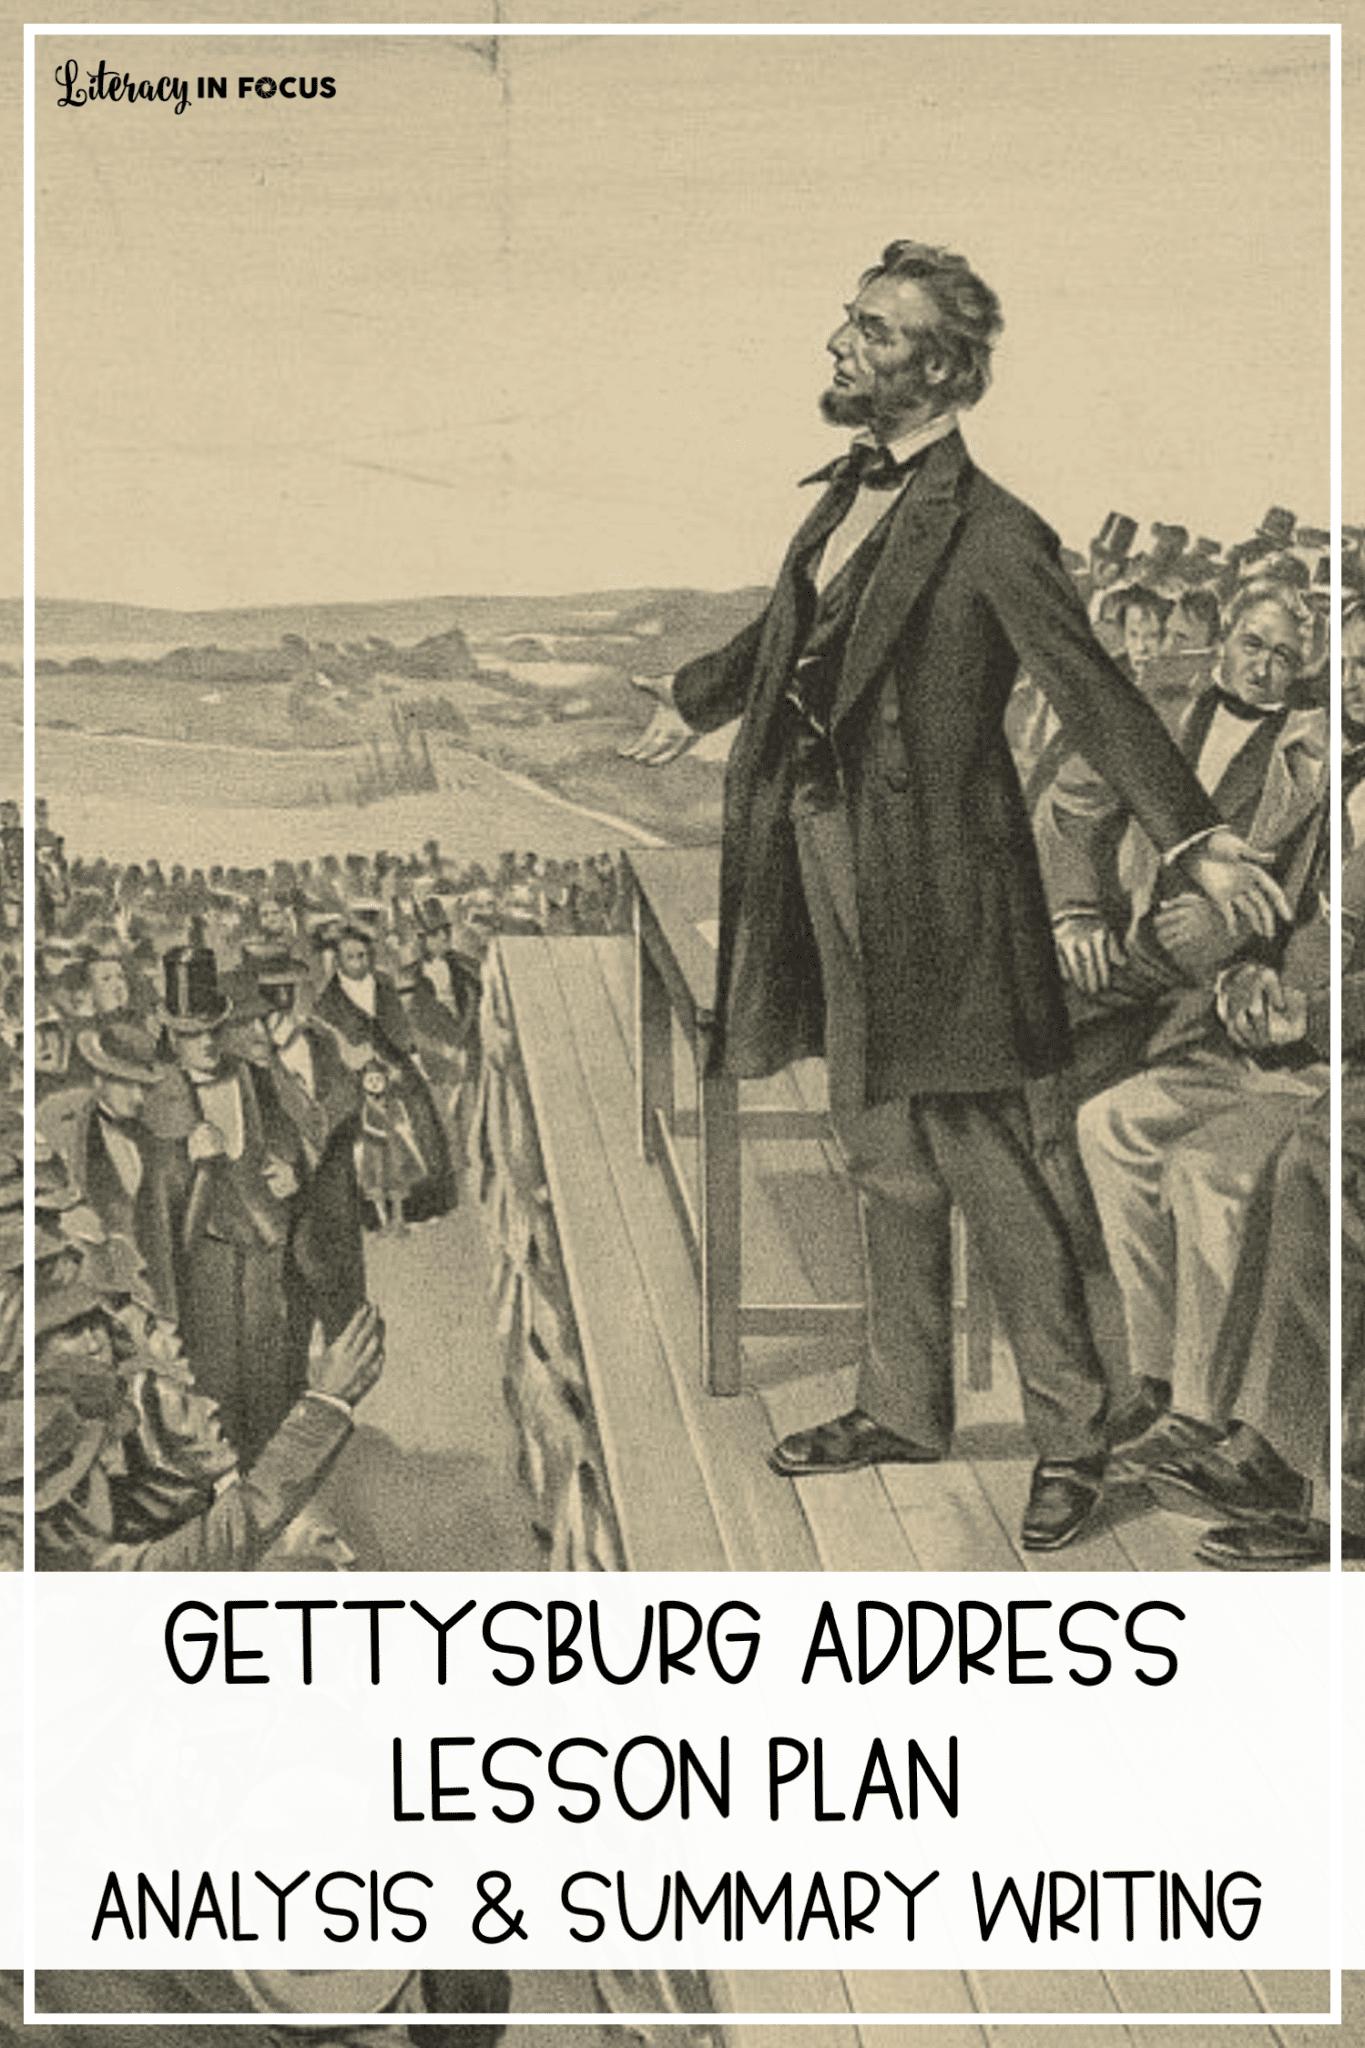 Gettysburg Address Lesson Plan 5th-8th Grade